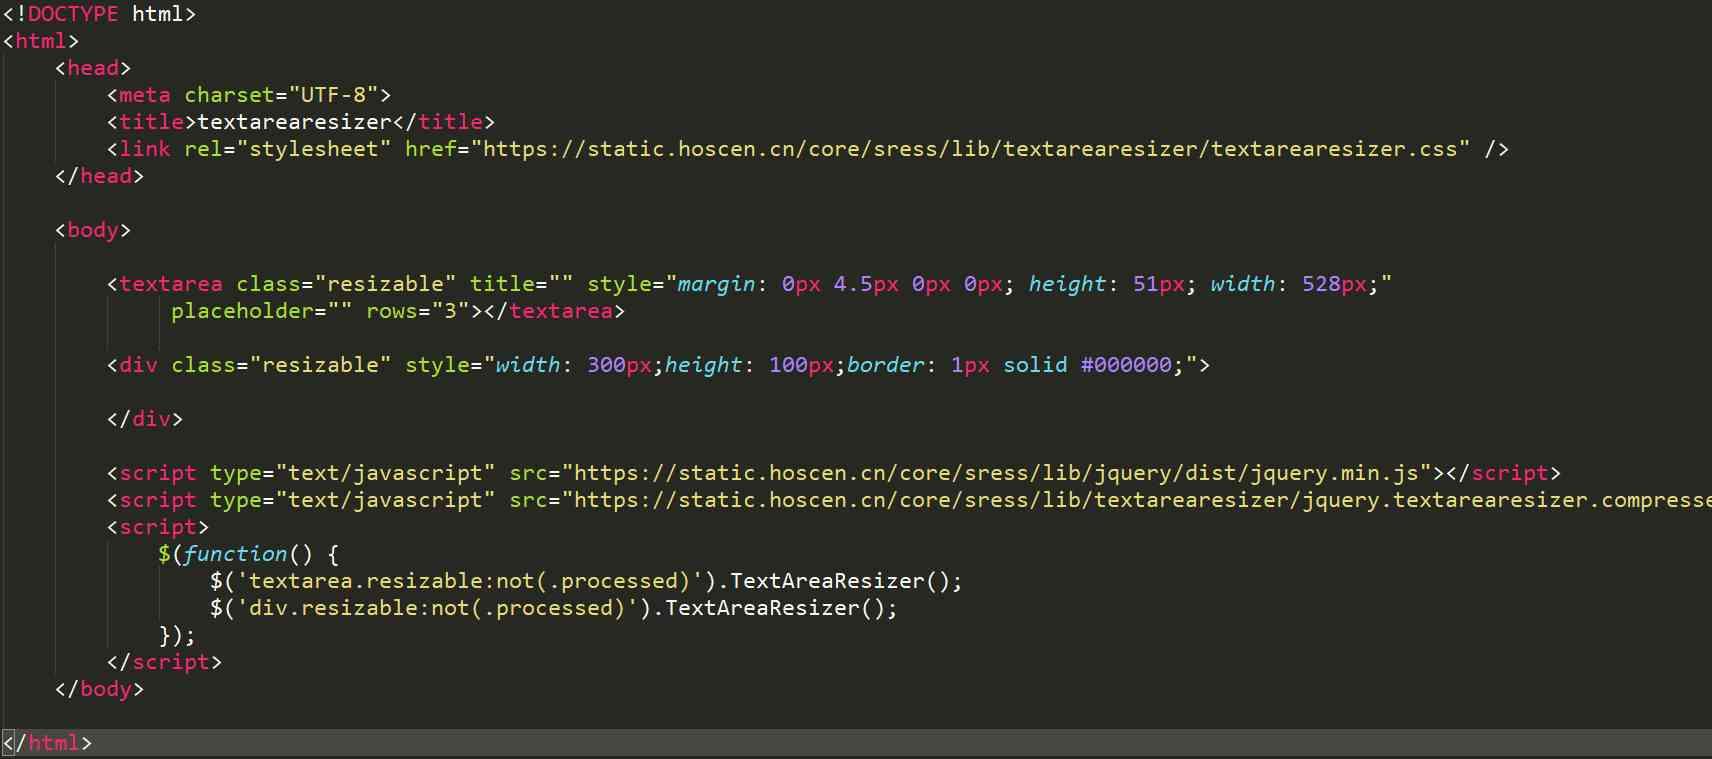 jQuery插件textarearesizer: 提供Resizer bar可拖动调整Textarea/div大小